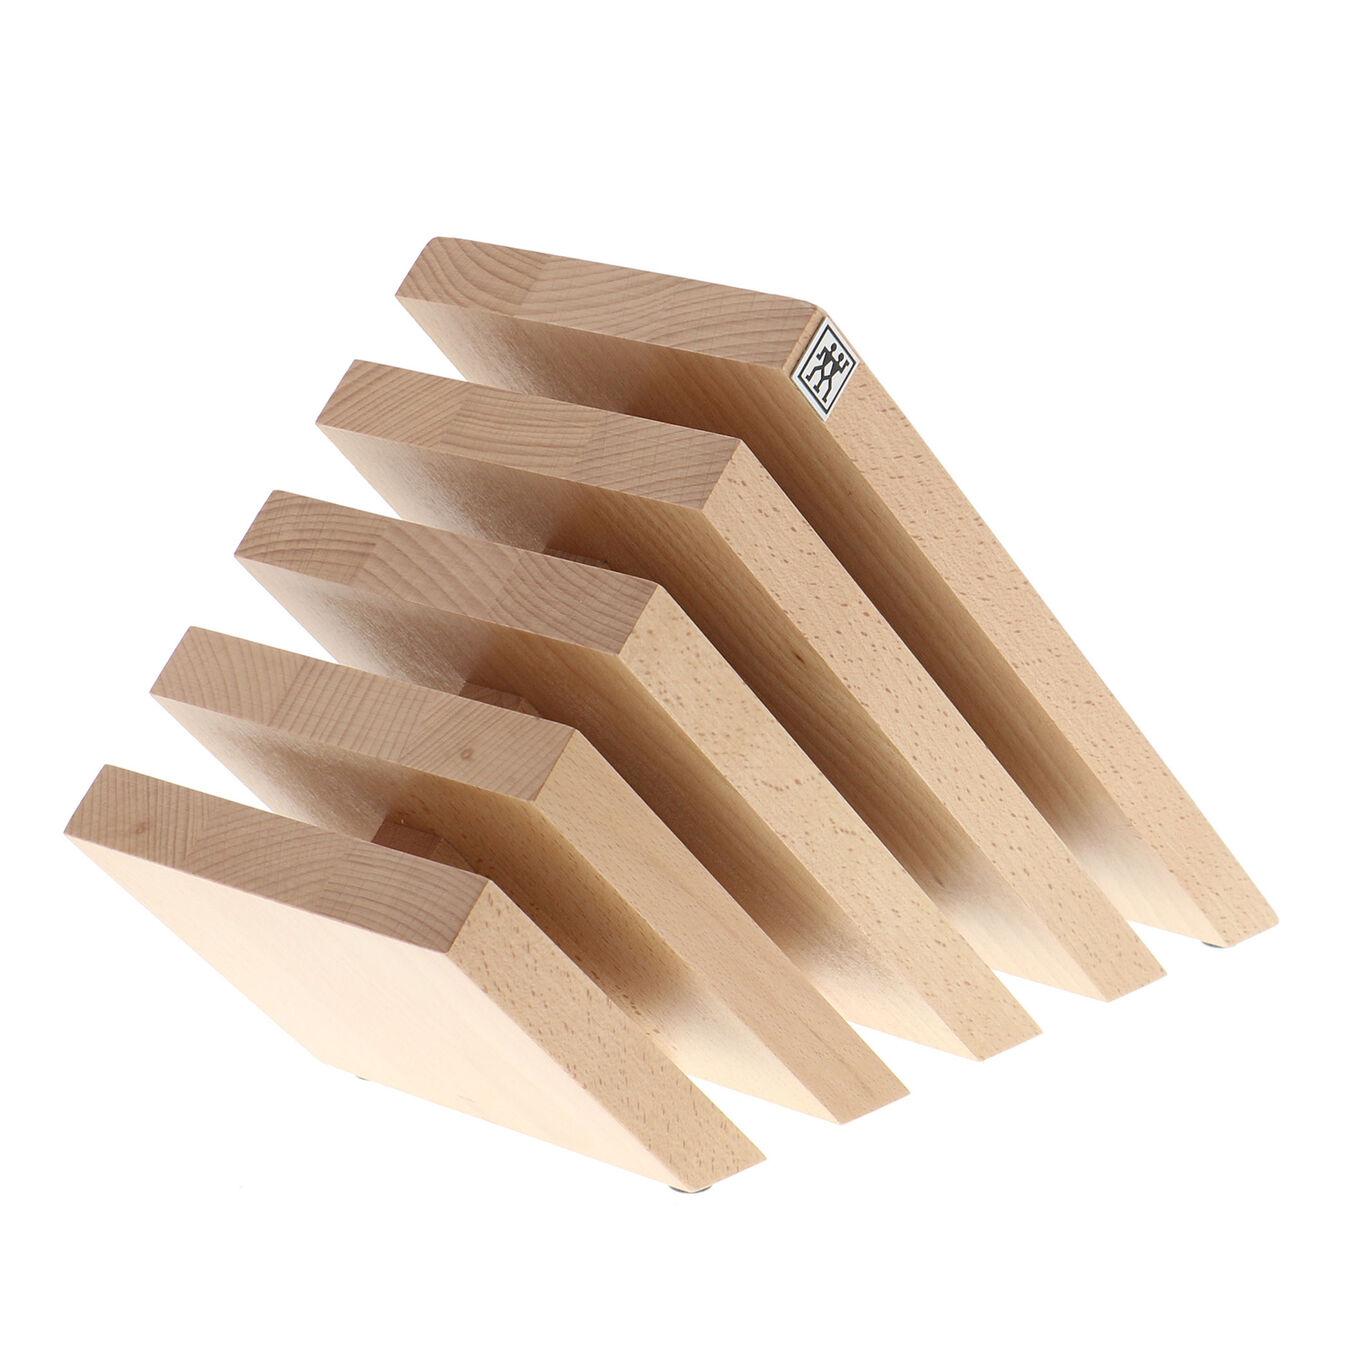 Beechwood, Slanted Italian Magnetic Block- Natural,,large 1